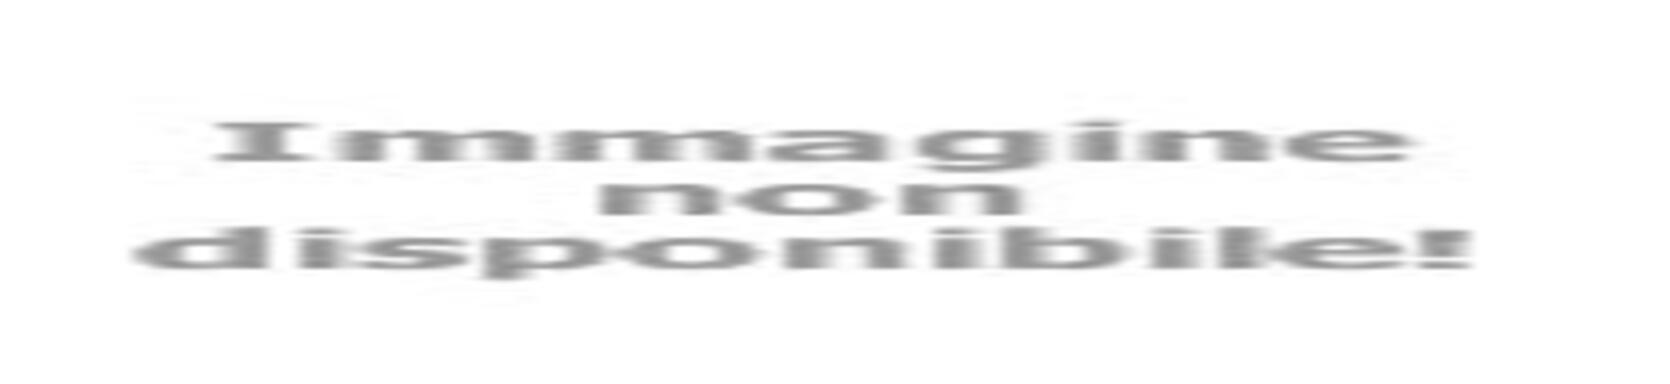 basketriminicrabs it 6-954-video-ceccarules-n.1 003